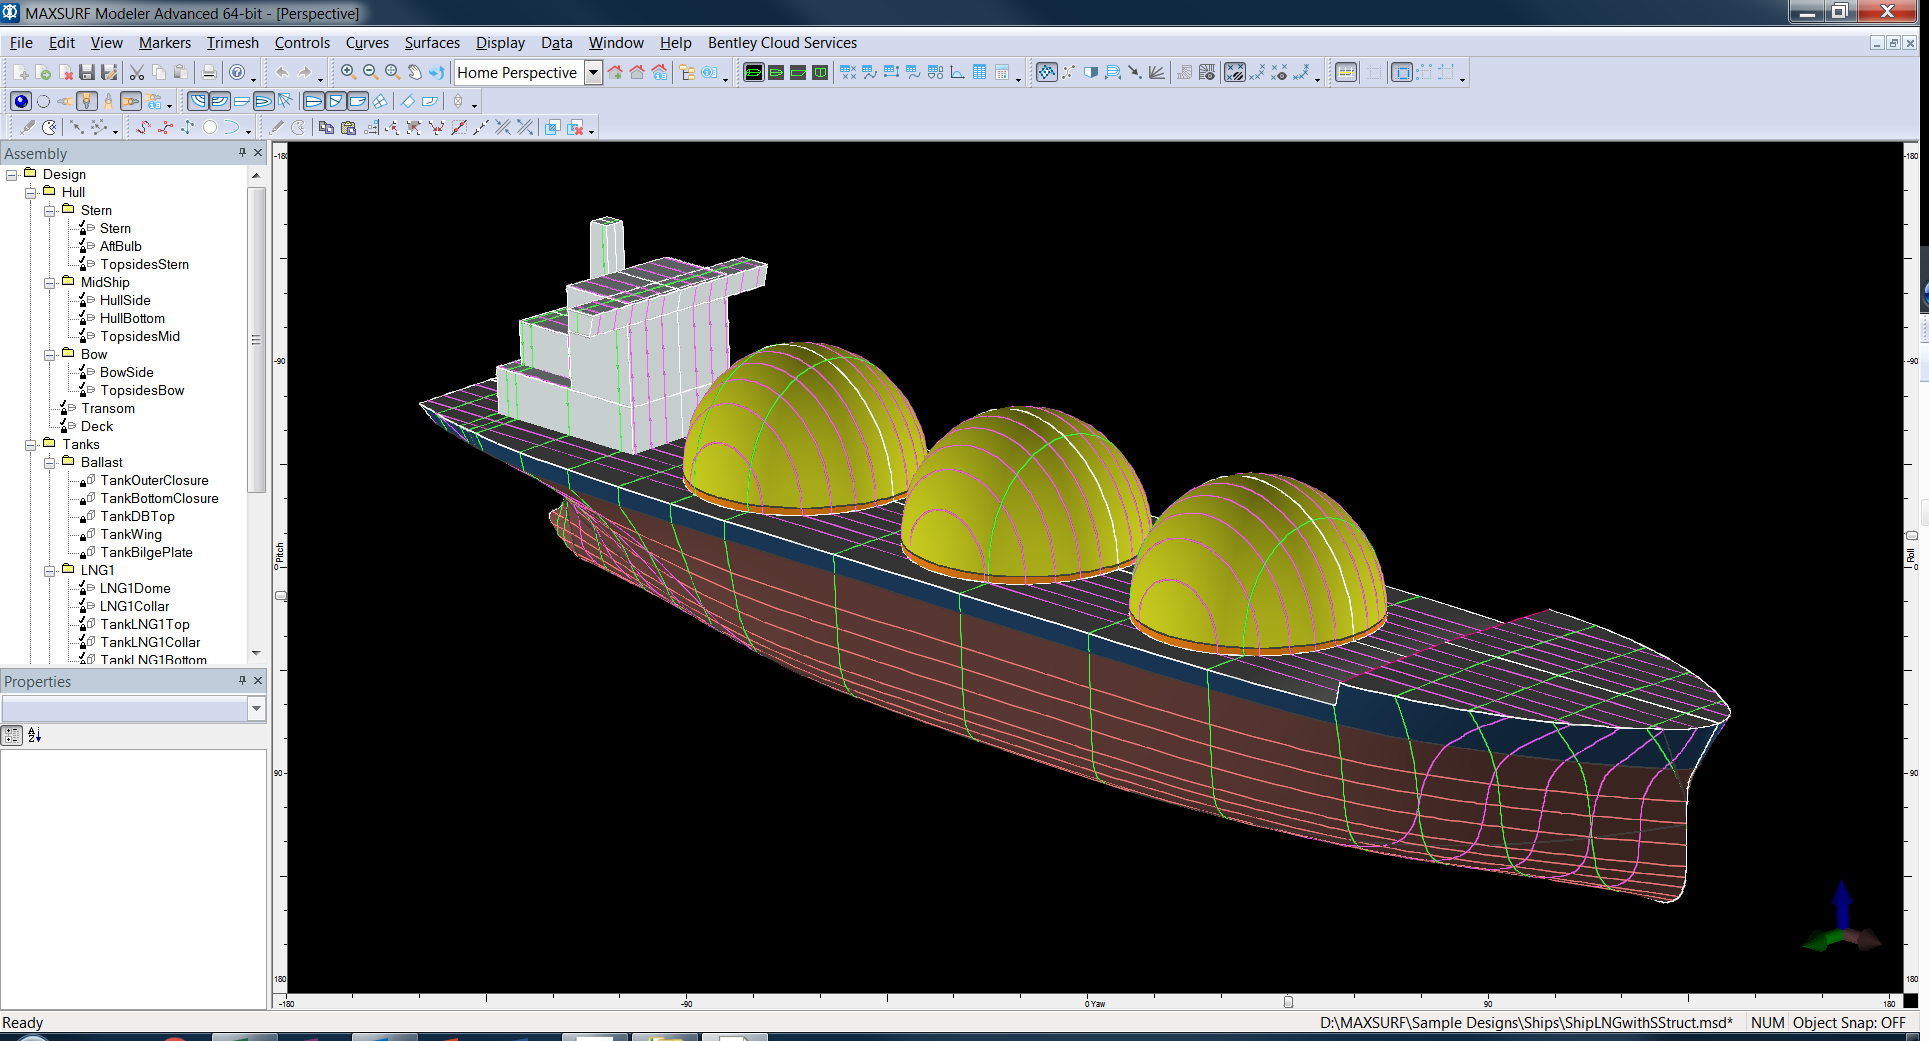 Maxsurf Naval Architecture Software for Conceptual Design